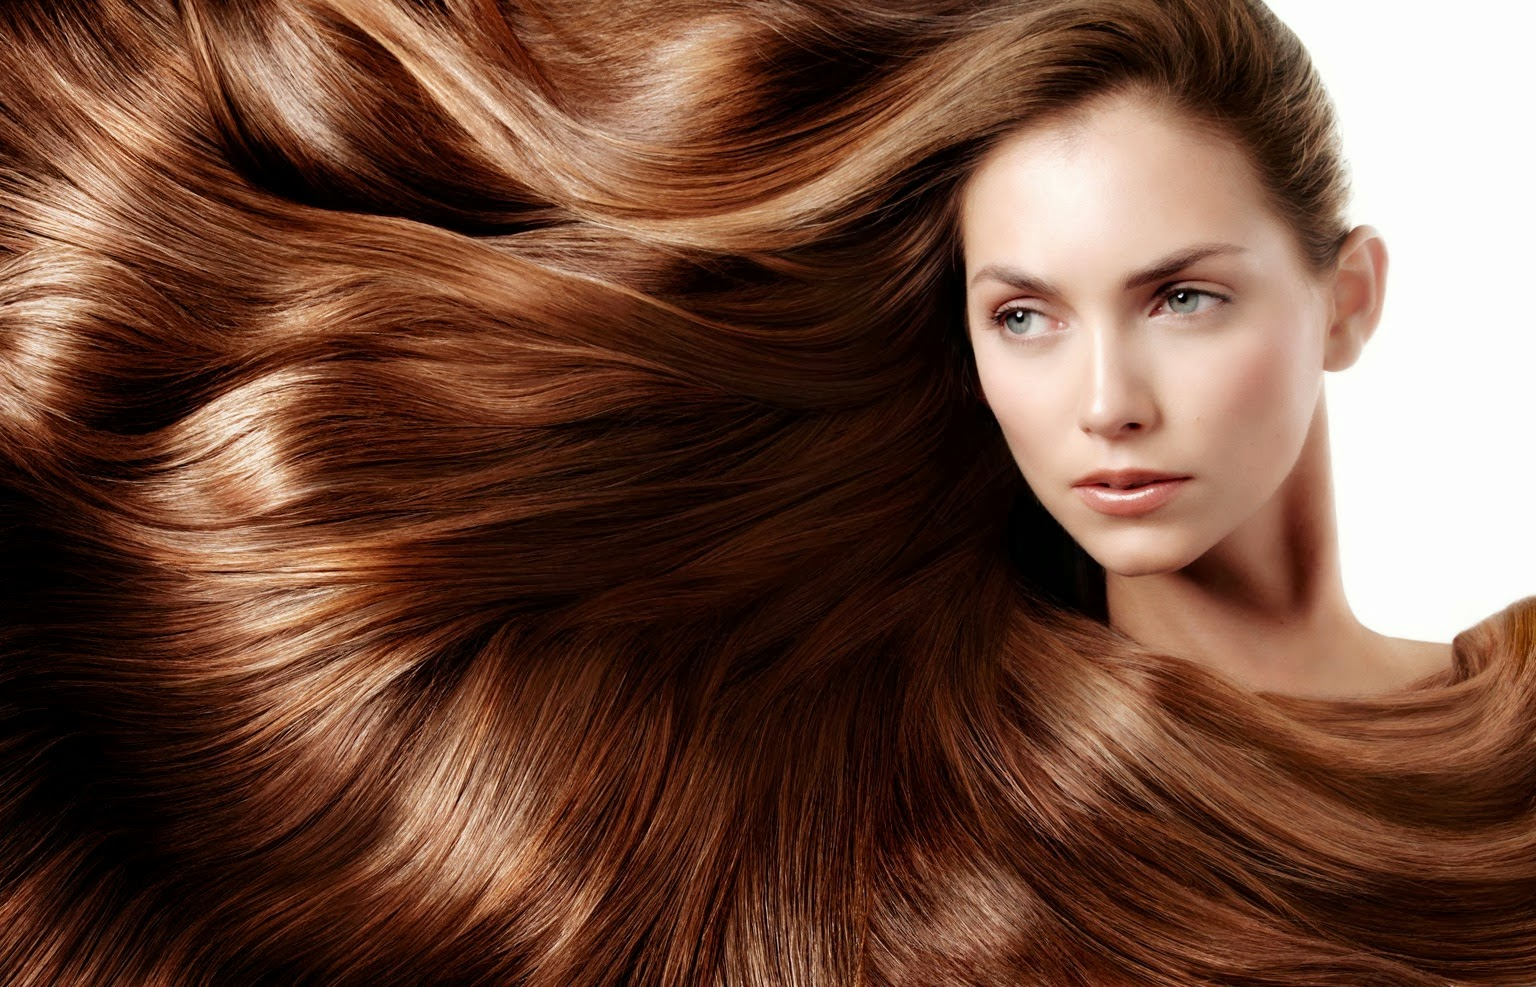 Peinados Para Entre Semana - 7 Peinados Diferentes De Lunes a Domingo! ColorfulMemories99